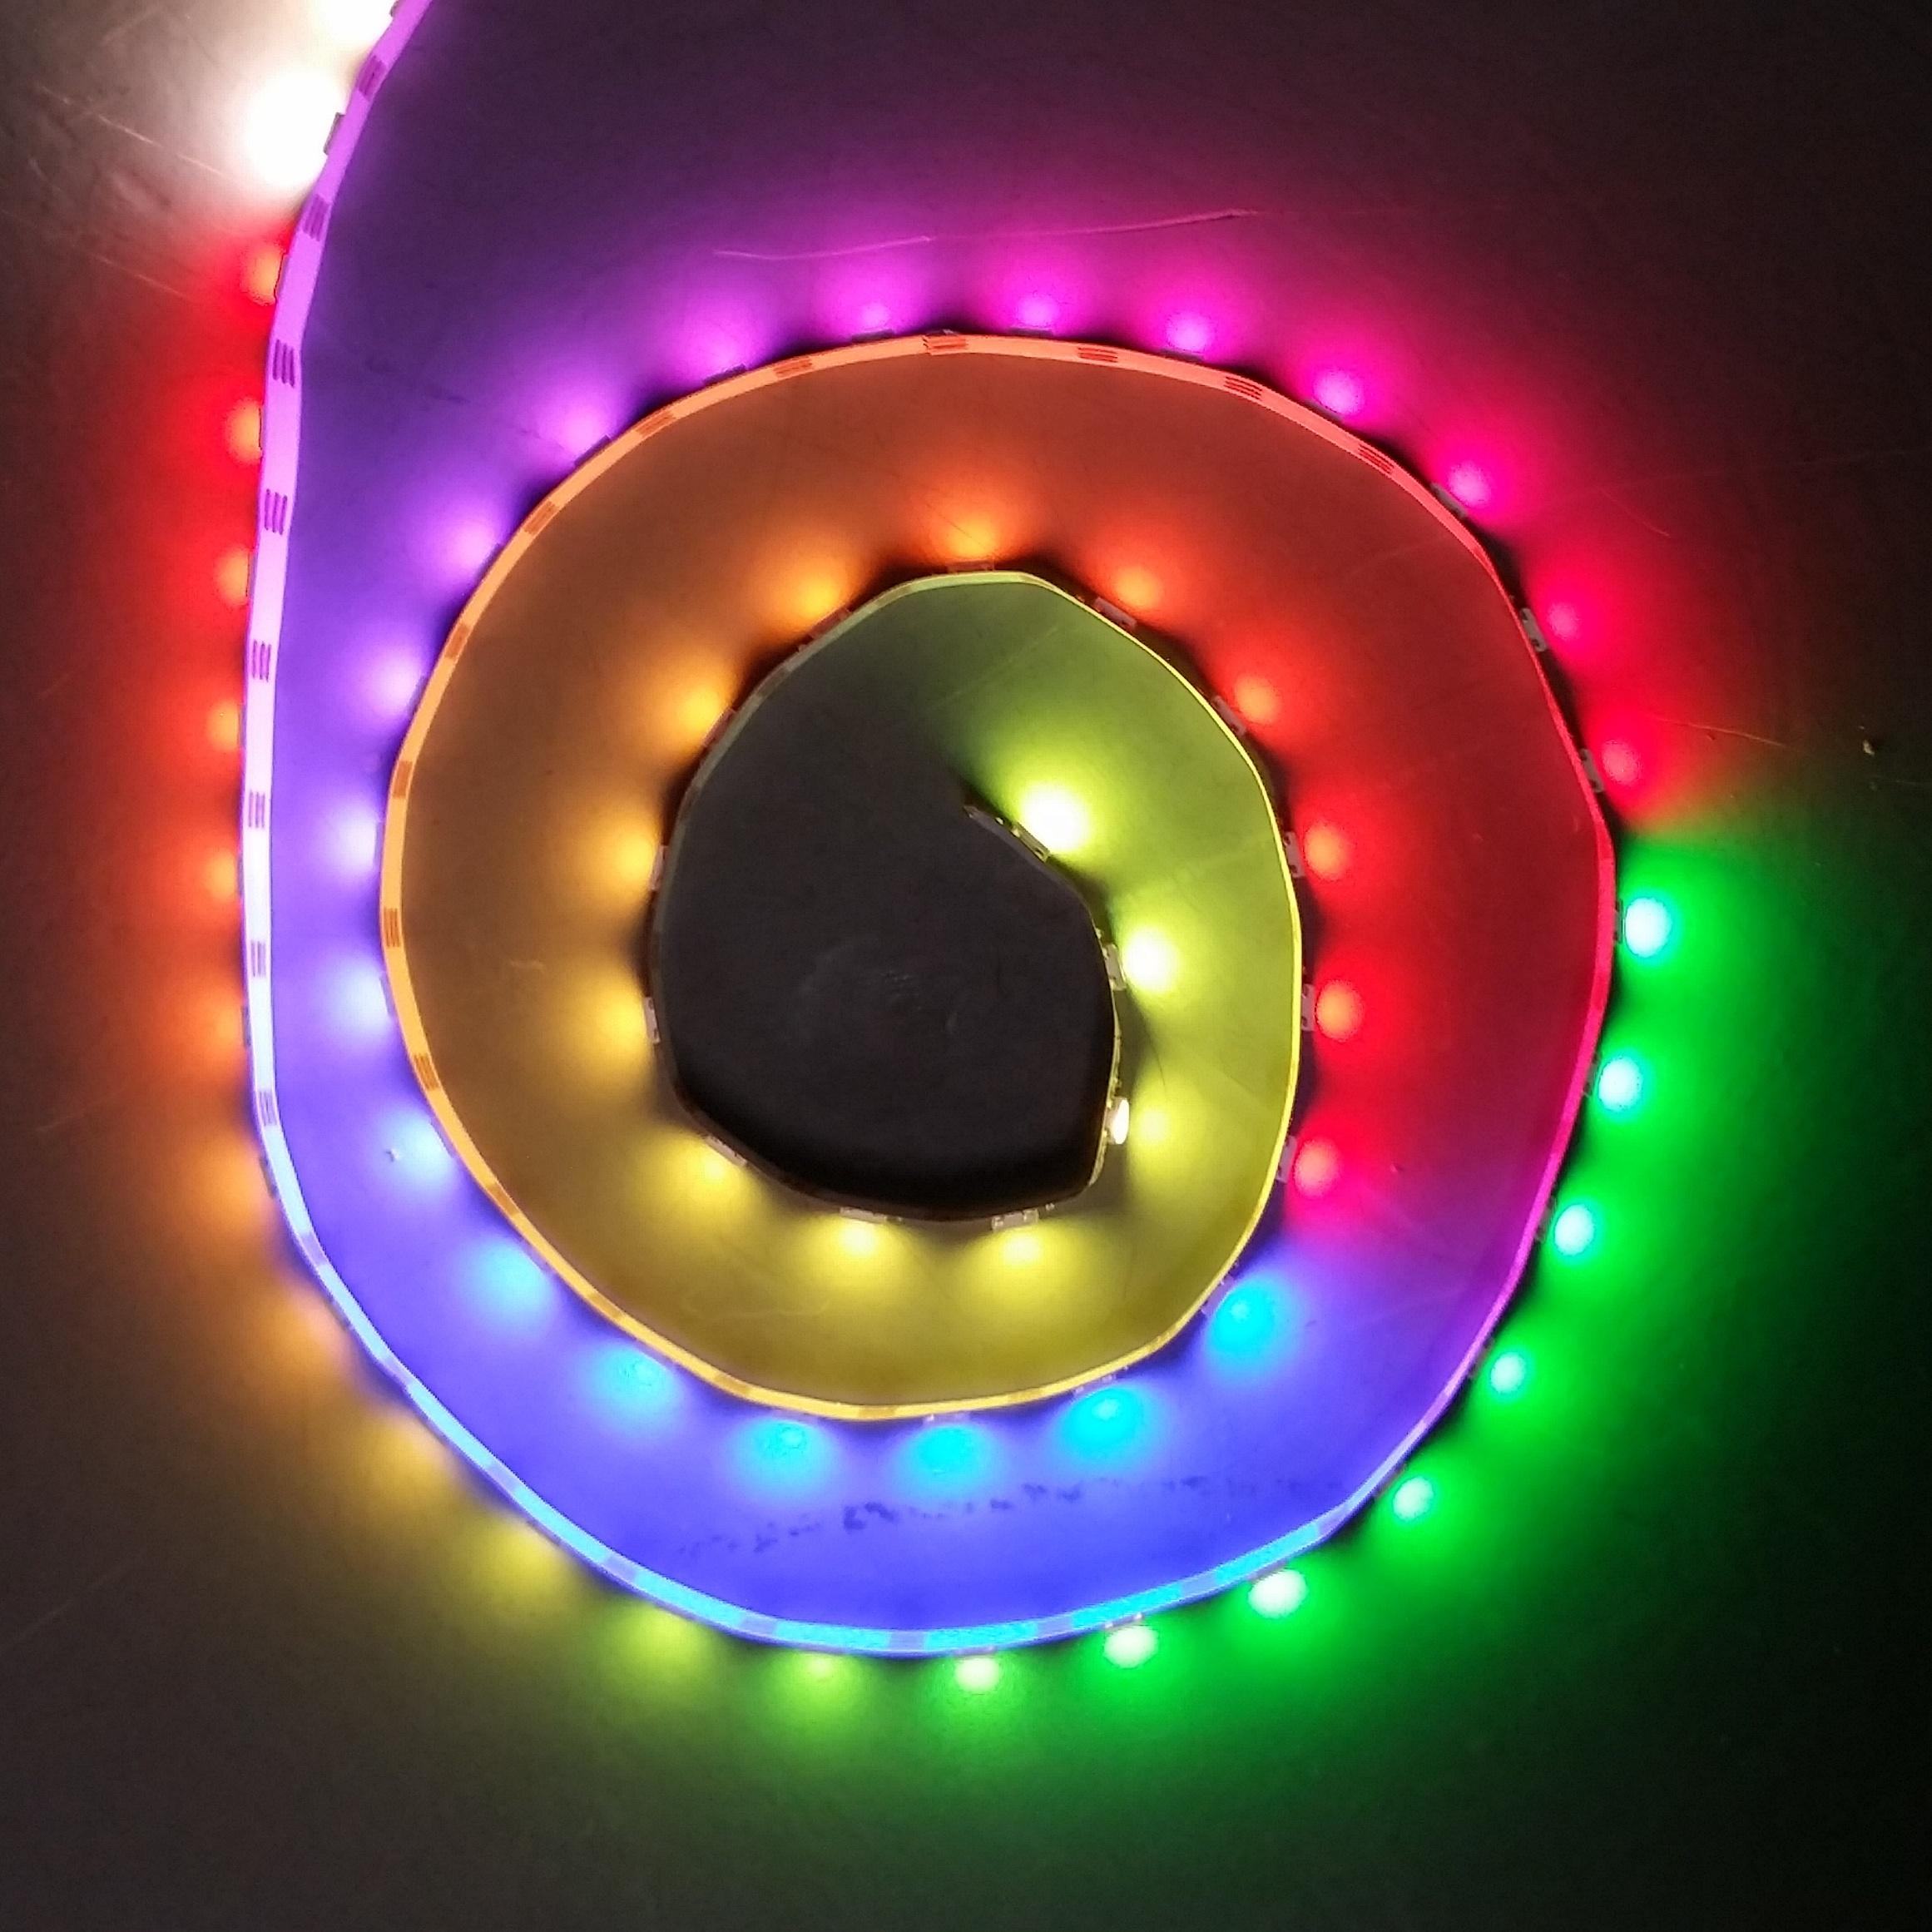 digital led strips rgb rgbw programmable strips full color led light strips ws2811 rgb digital strips white addressable strips